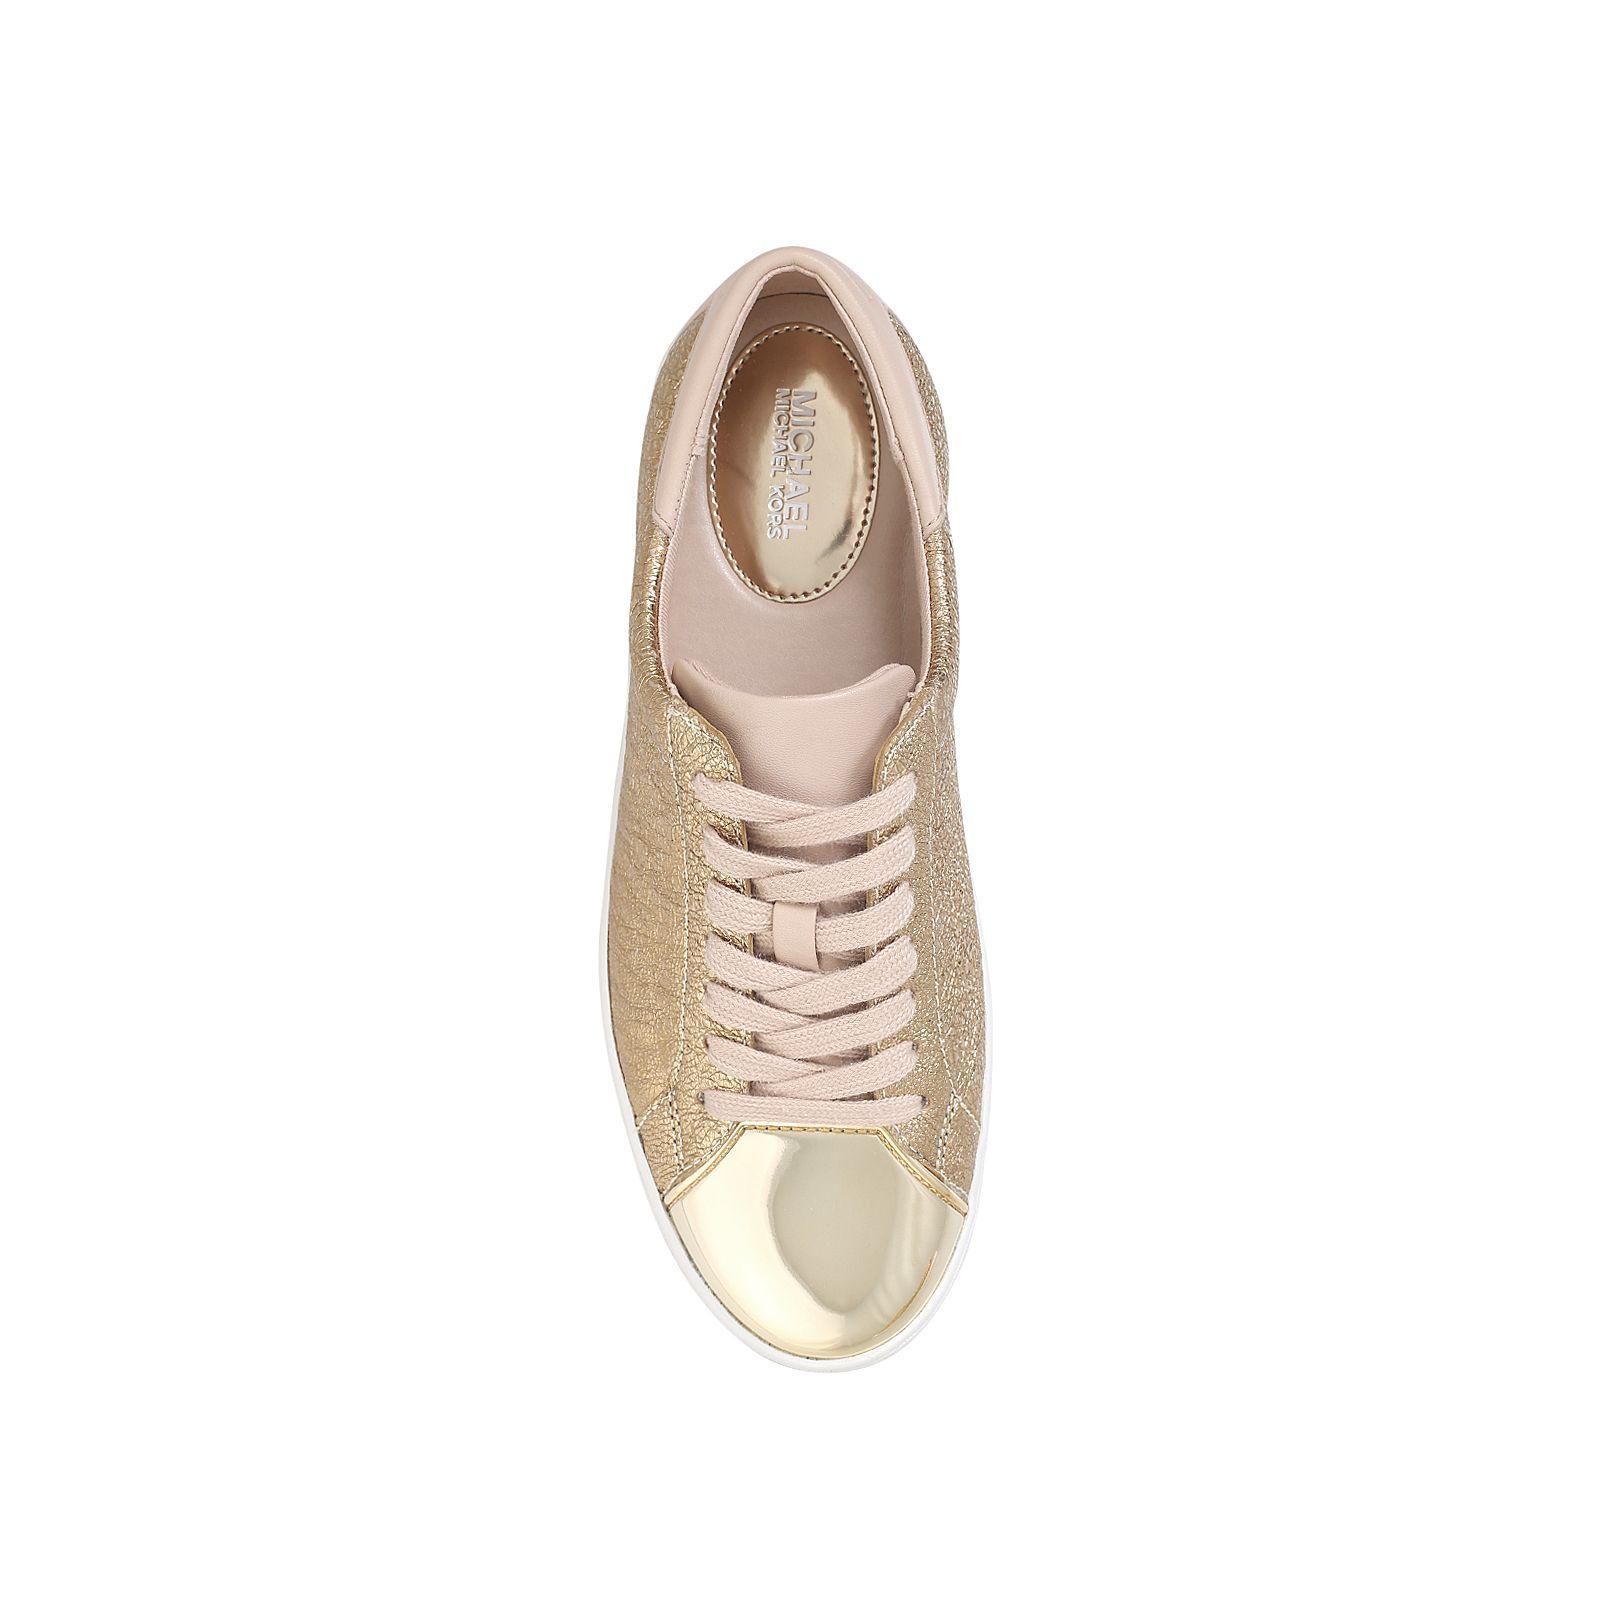 Michael Kors Leather Frankie Sneakers in Gold (Metallic)